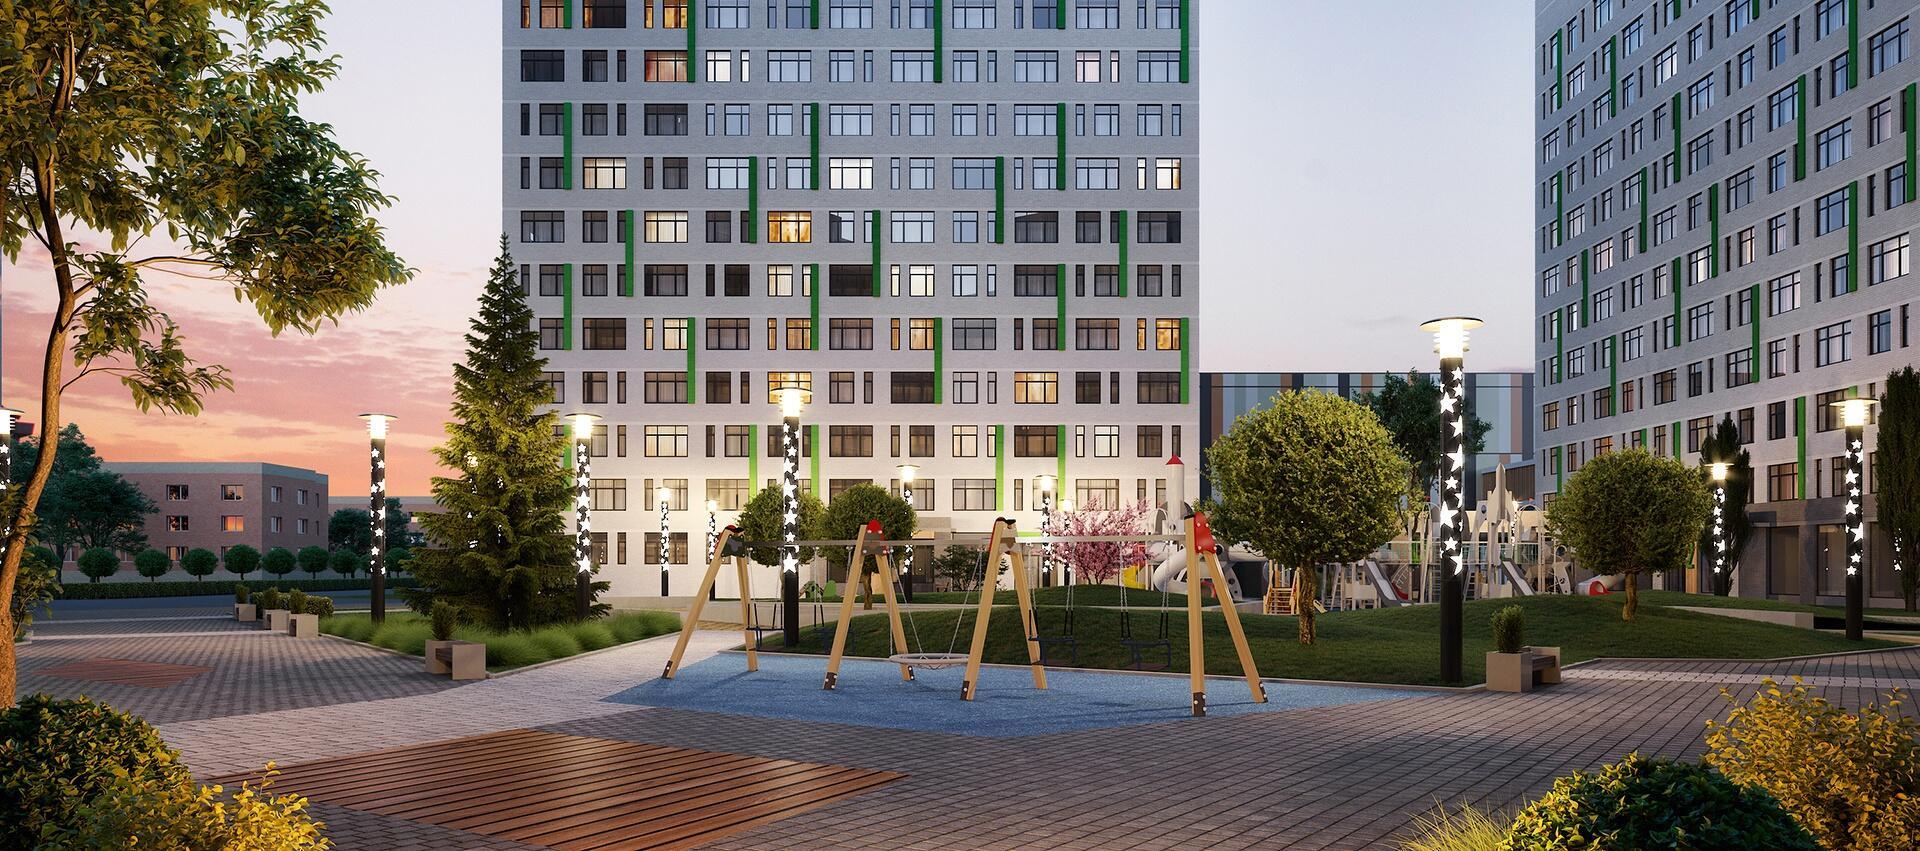 Скидка 300 000 рублей на квартиры в новом доме возле ТРЦ «Сити Молл»